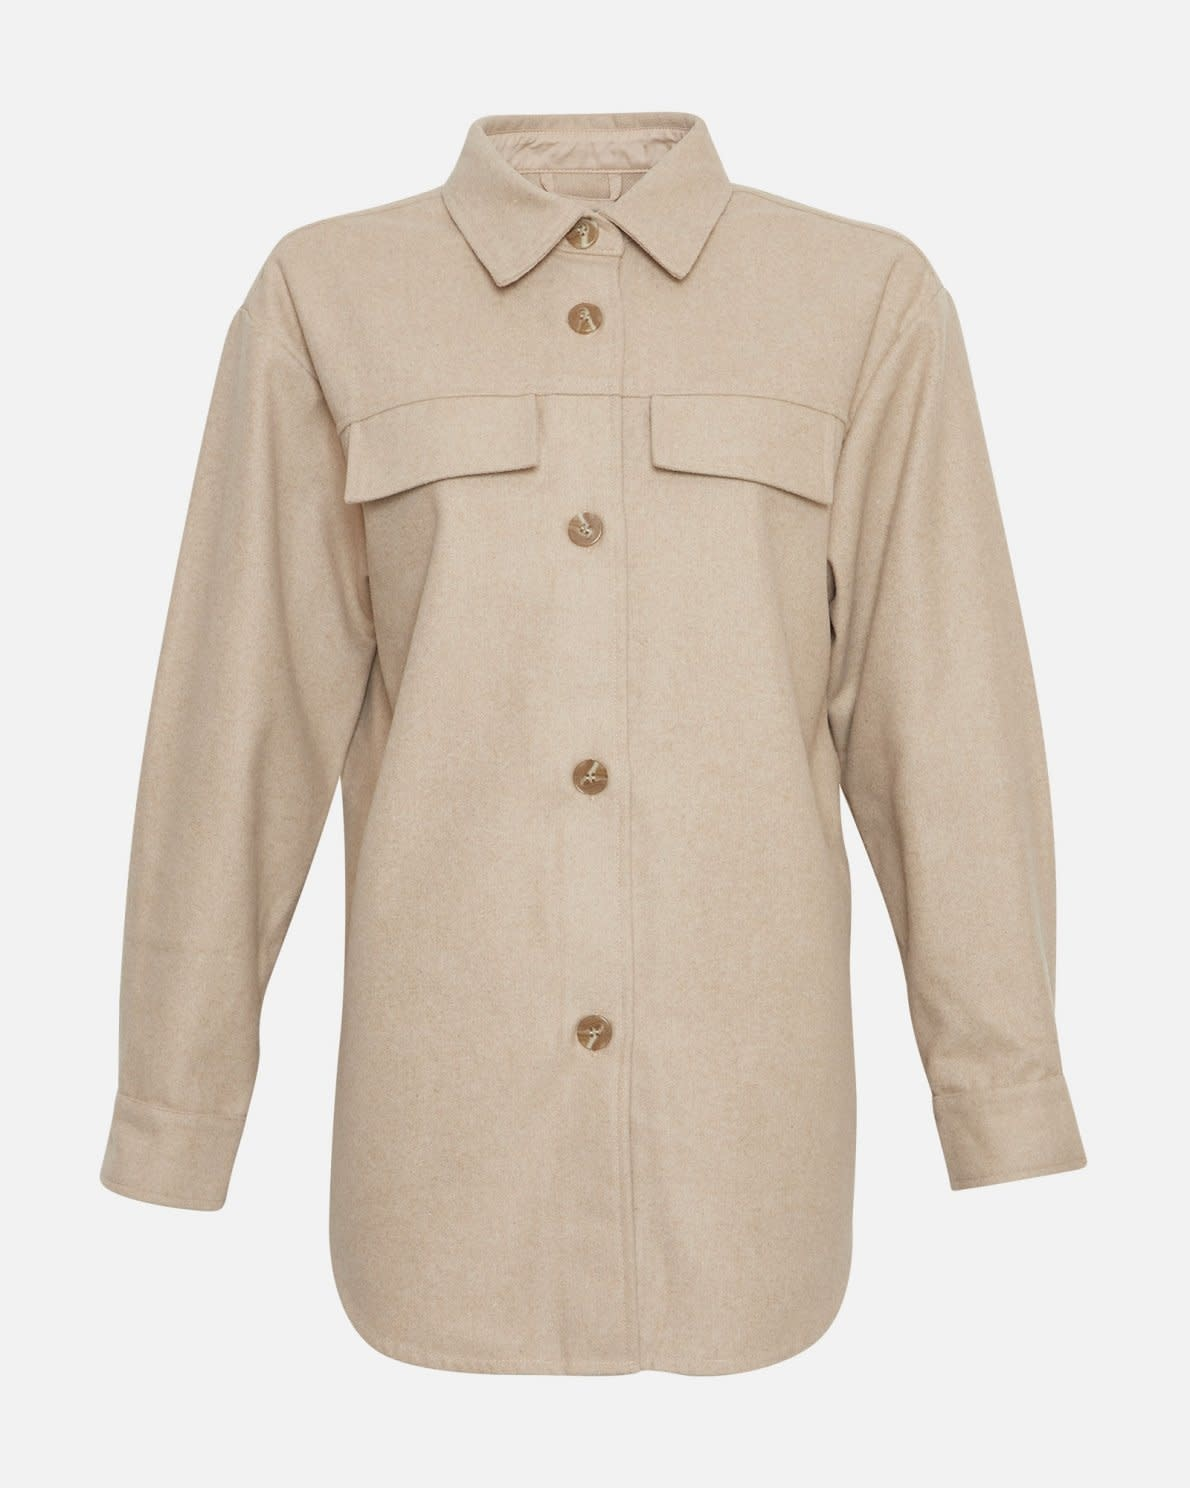 Maude White Pepper Overshirt Jacket-1